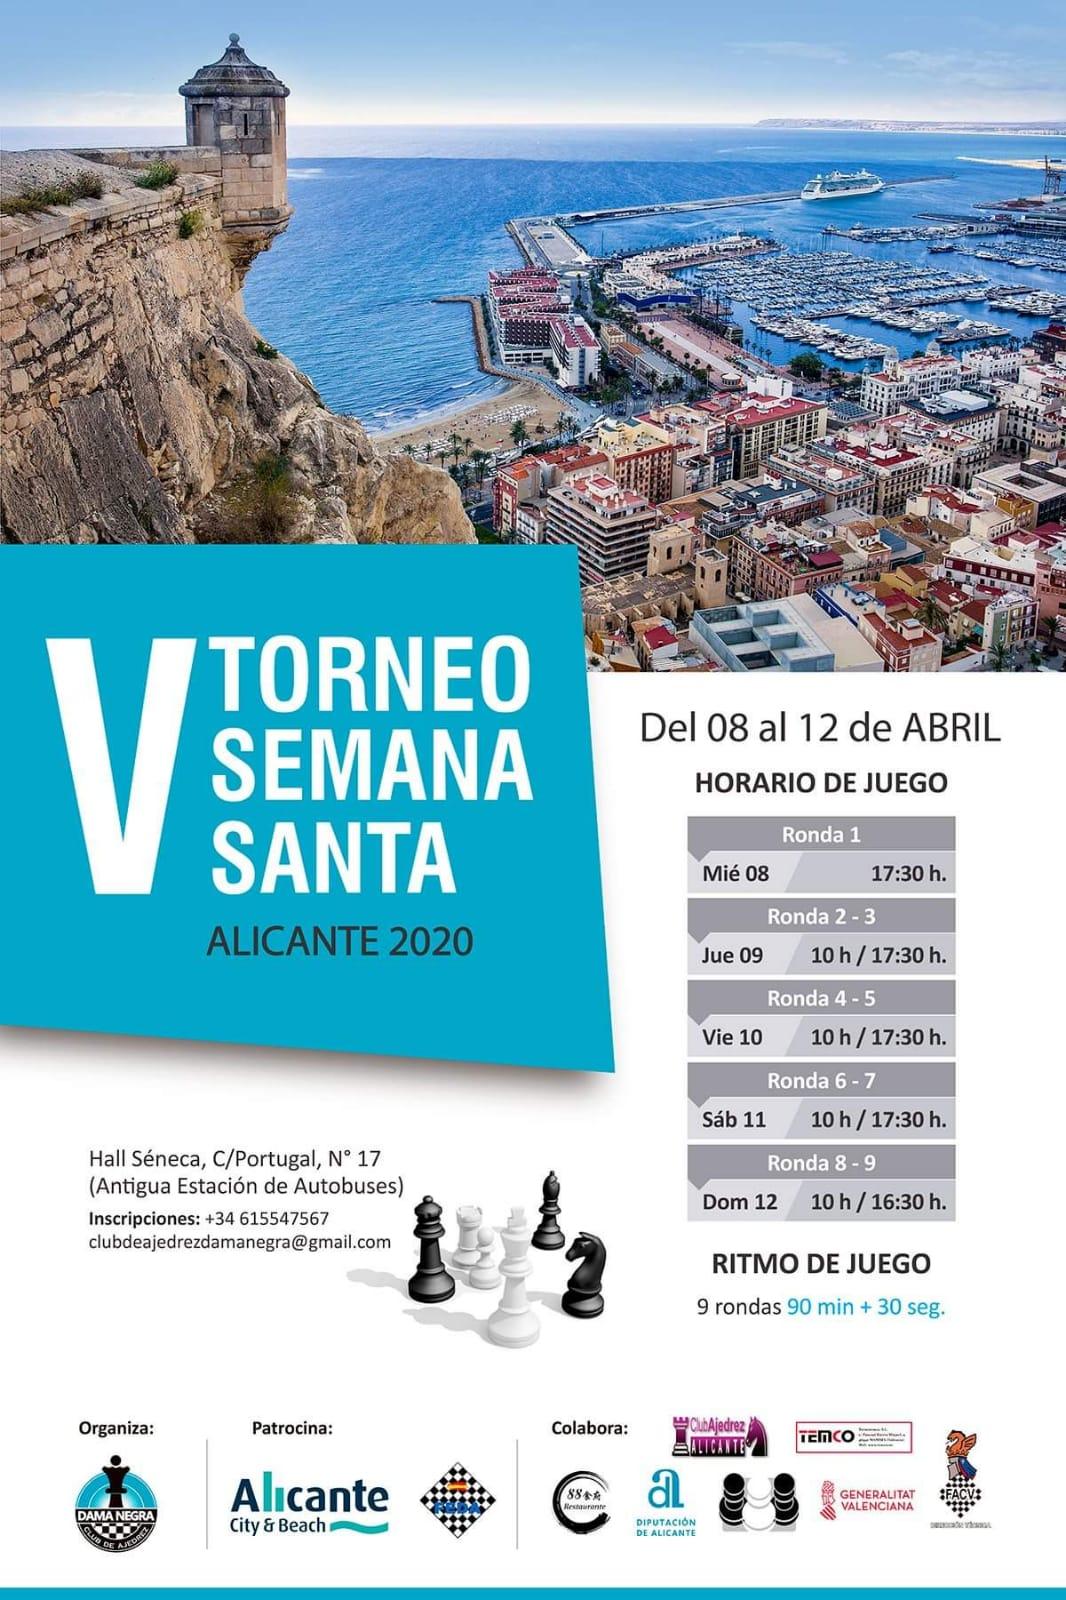 V Semana Santa Alicante